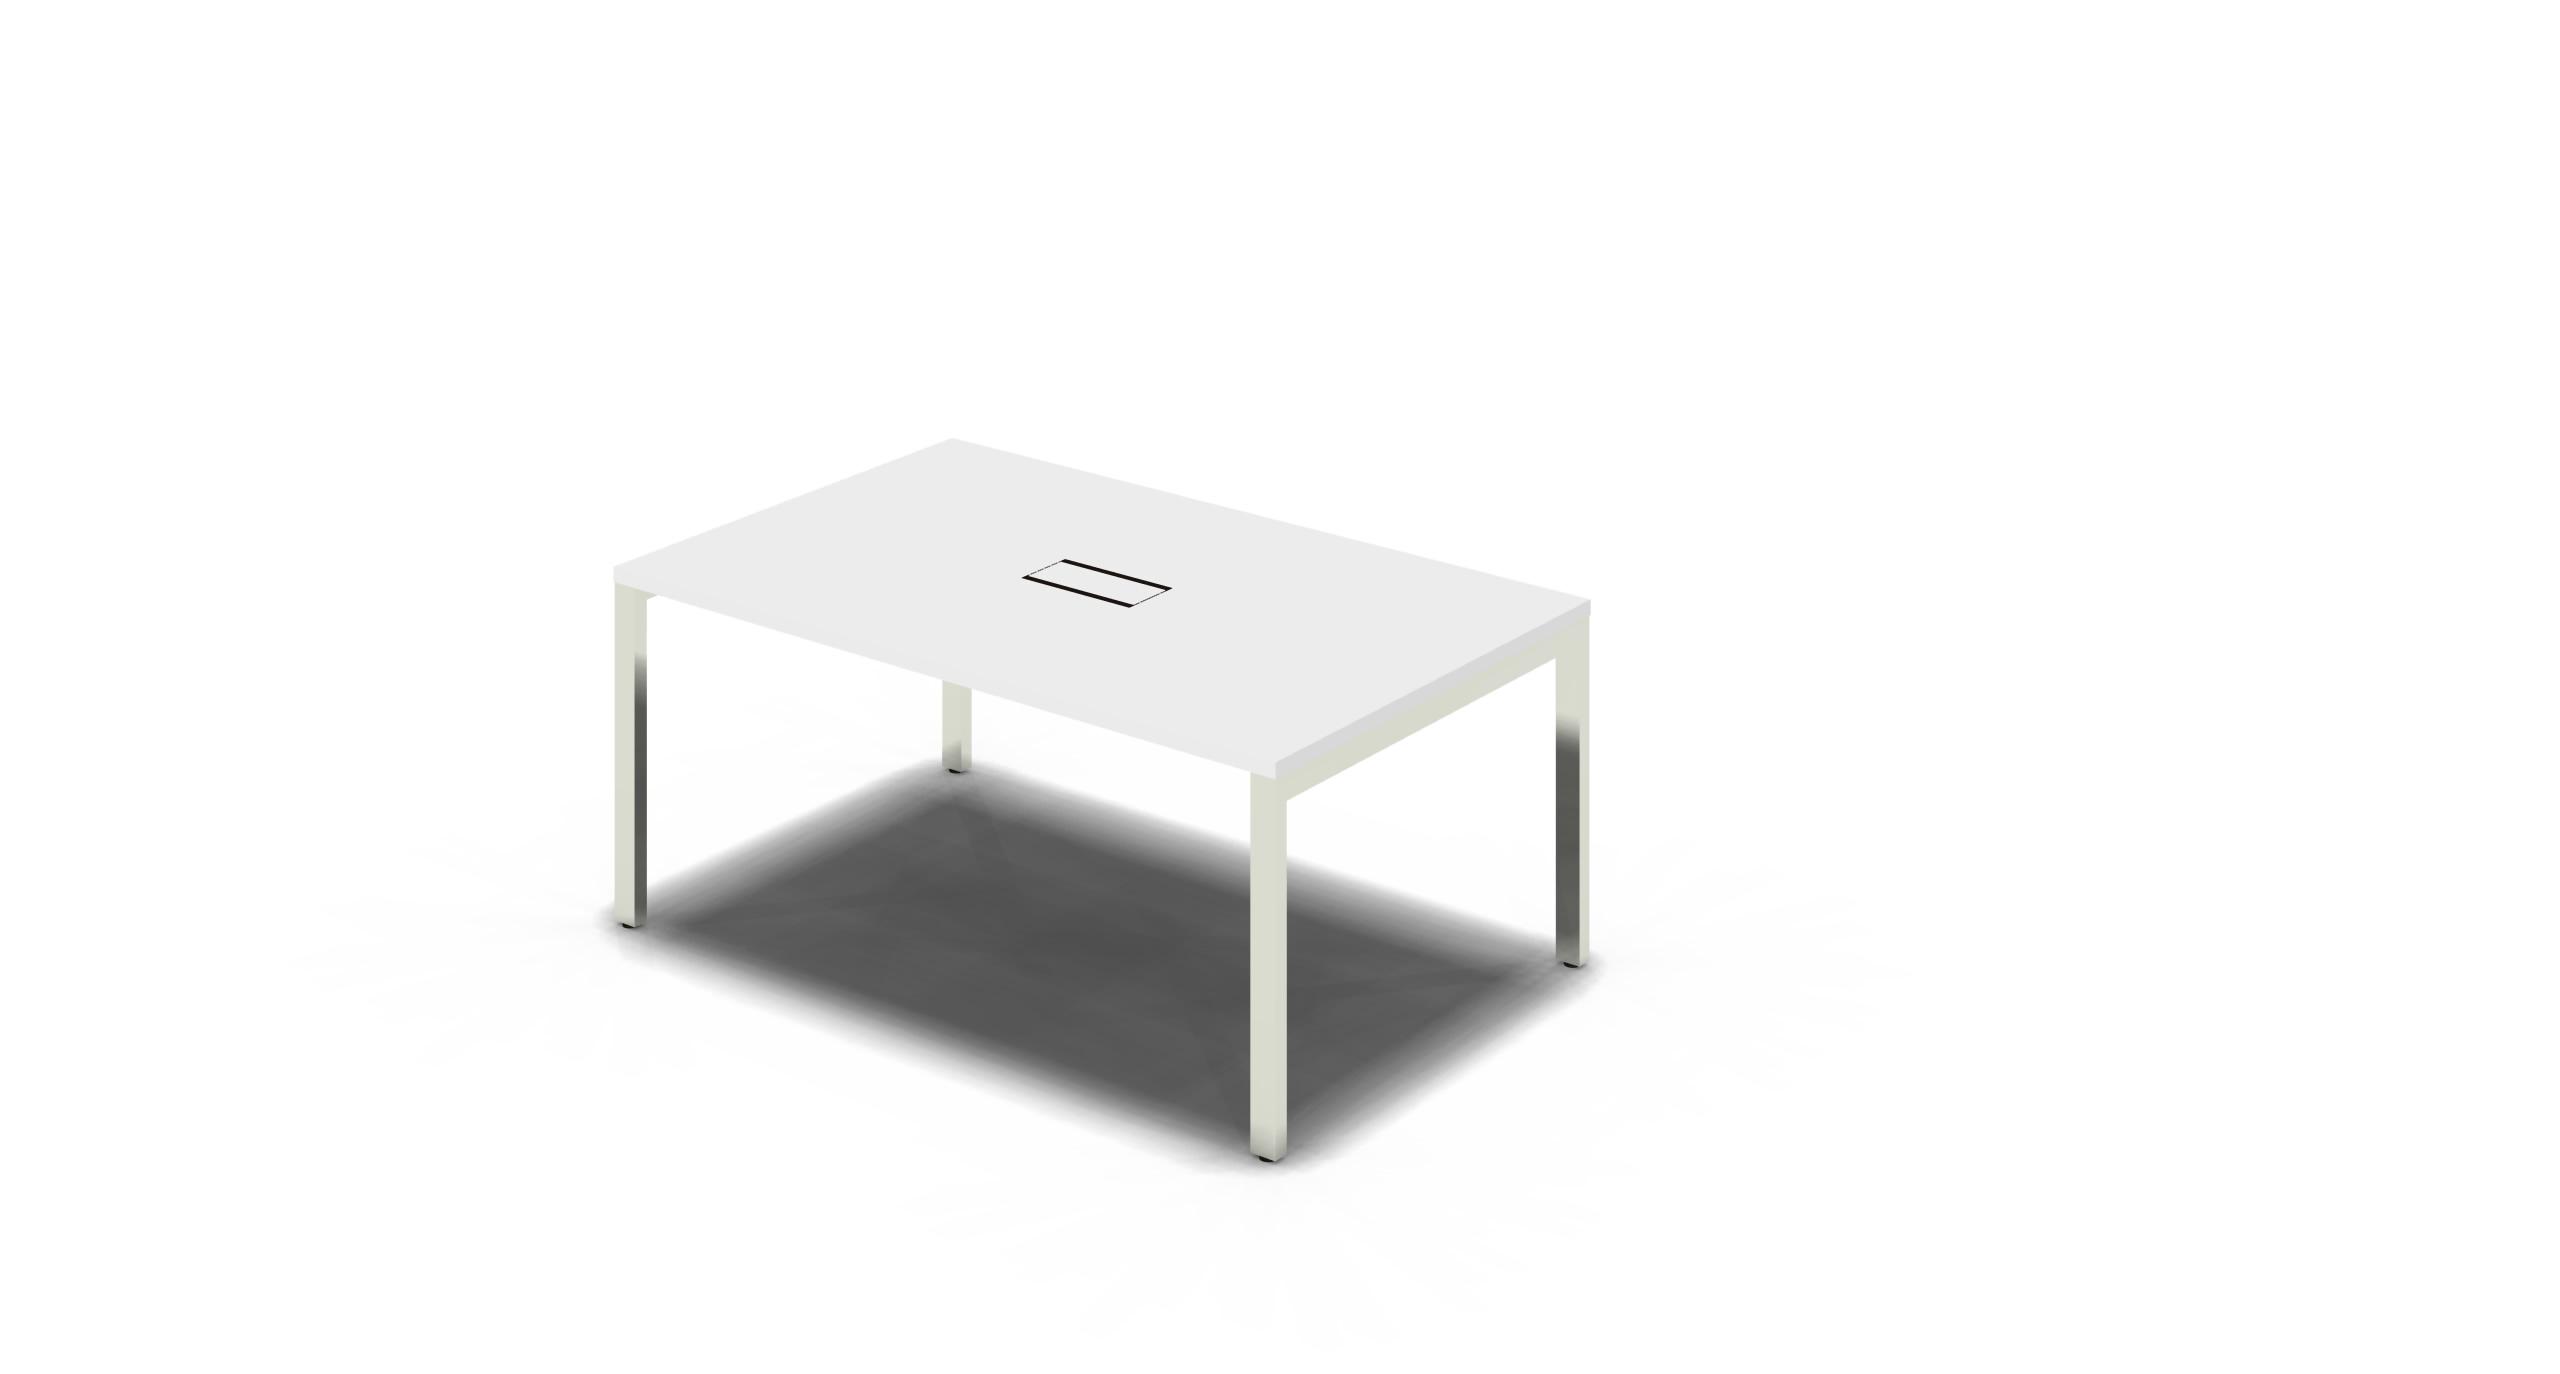 Table_Square_1500x900_Chrome_White_withOption